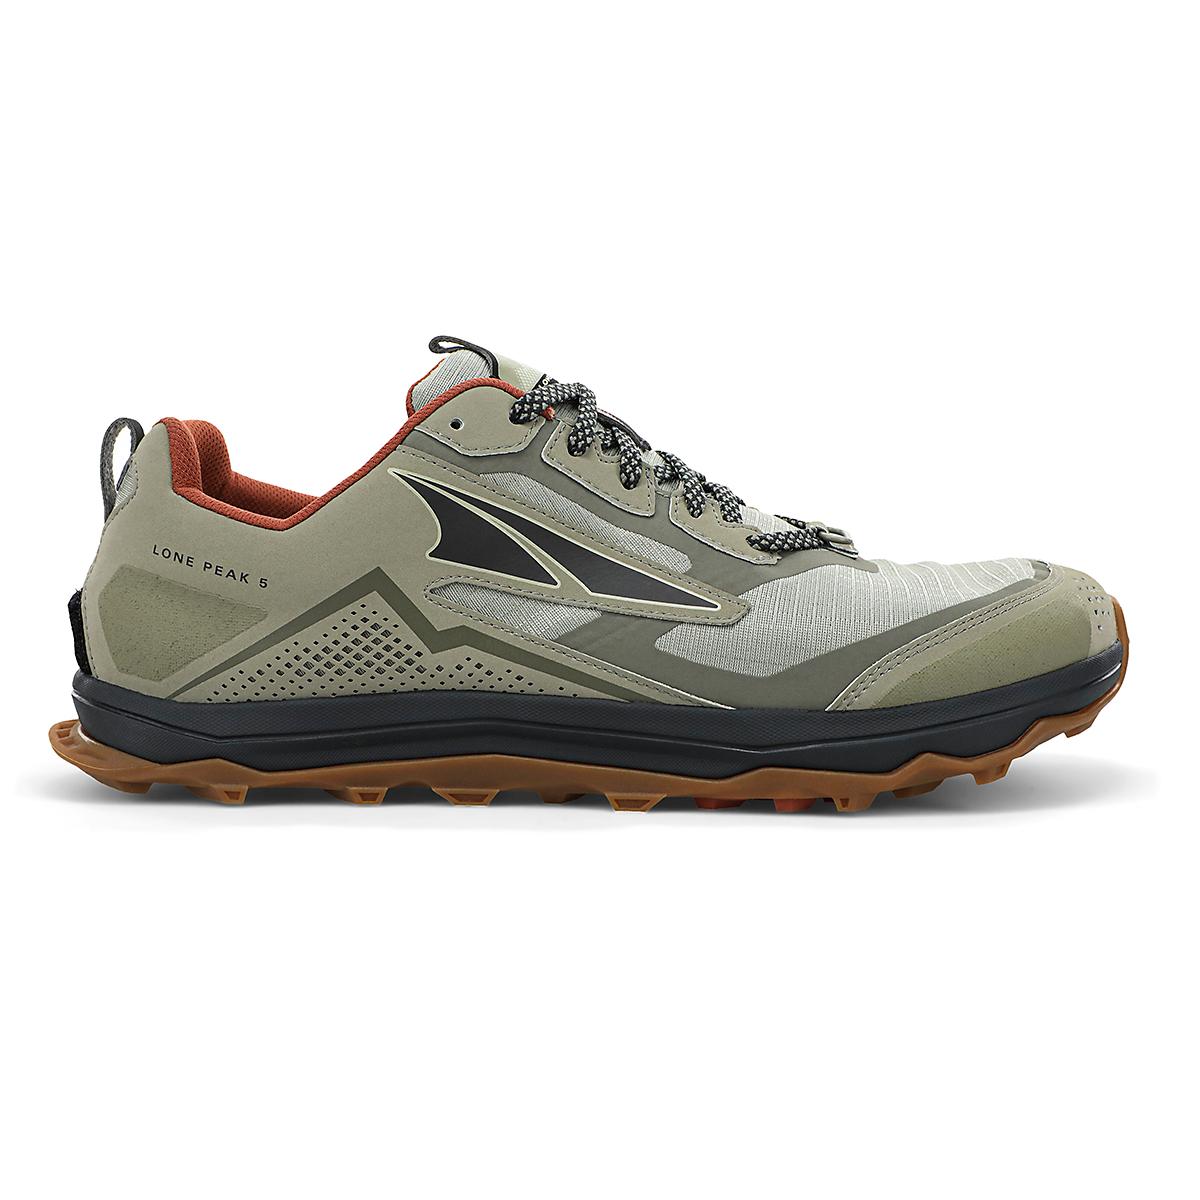 Men's Altra Lone Peak 5 Trail Running Shoe - Color: Khaki - Size: 7 - Width: Regular, Khaki, large, image 1